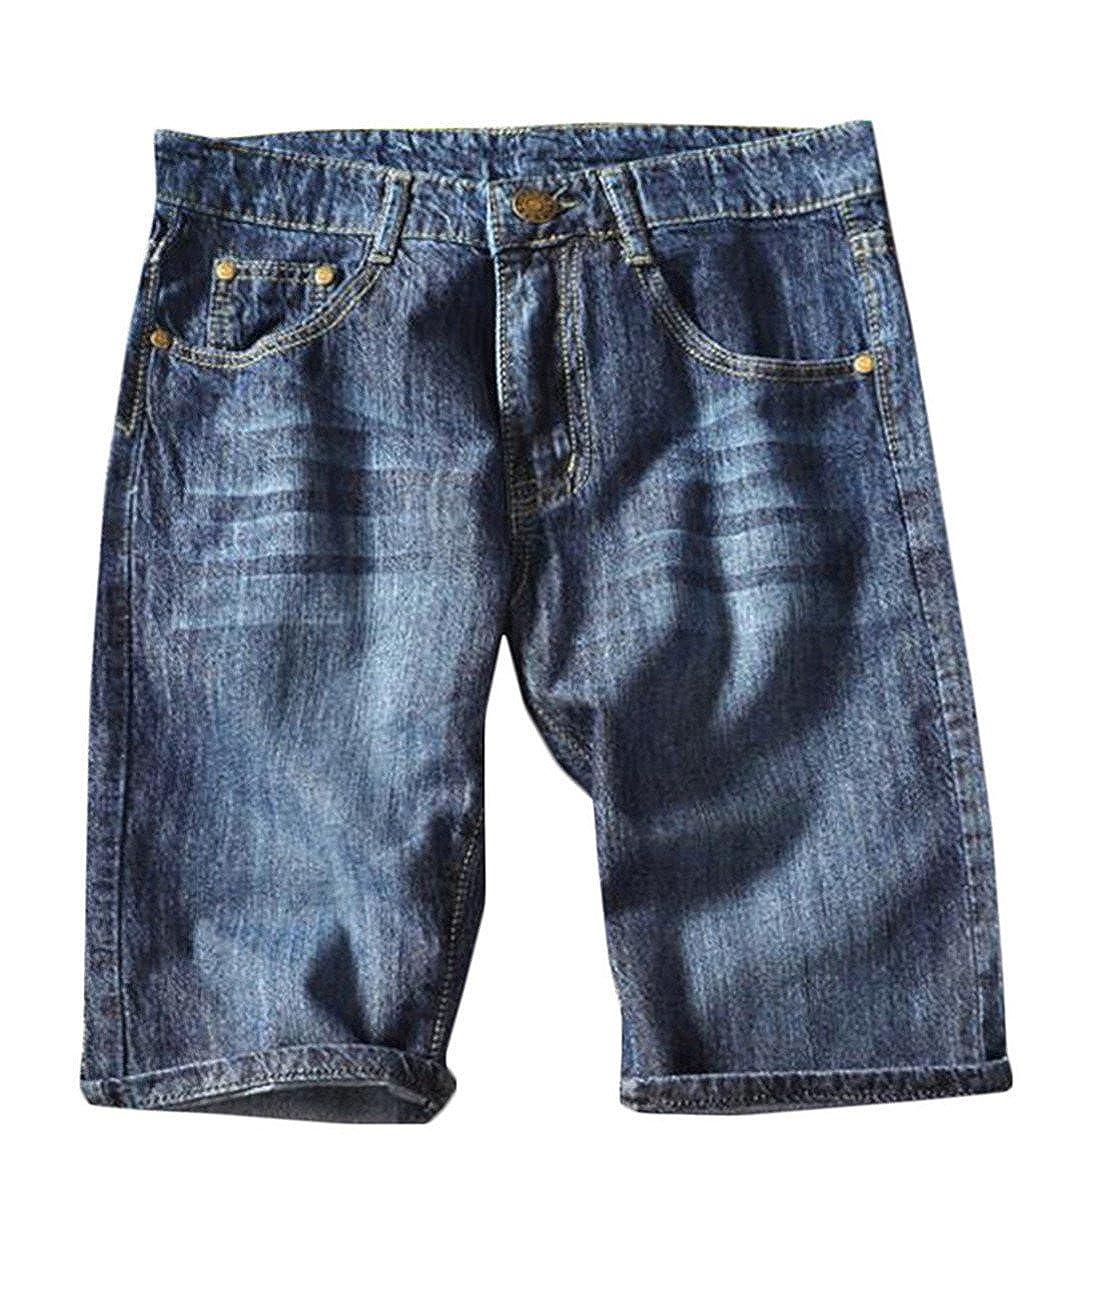 Nanquan-men clothes NQ Mens Ripped Denim Shorts Distressed Jeans Light Washed XL-5XL